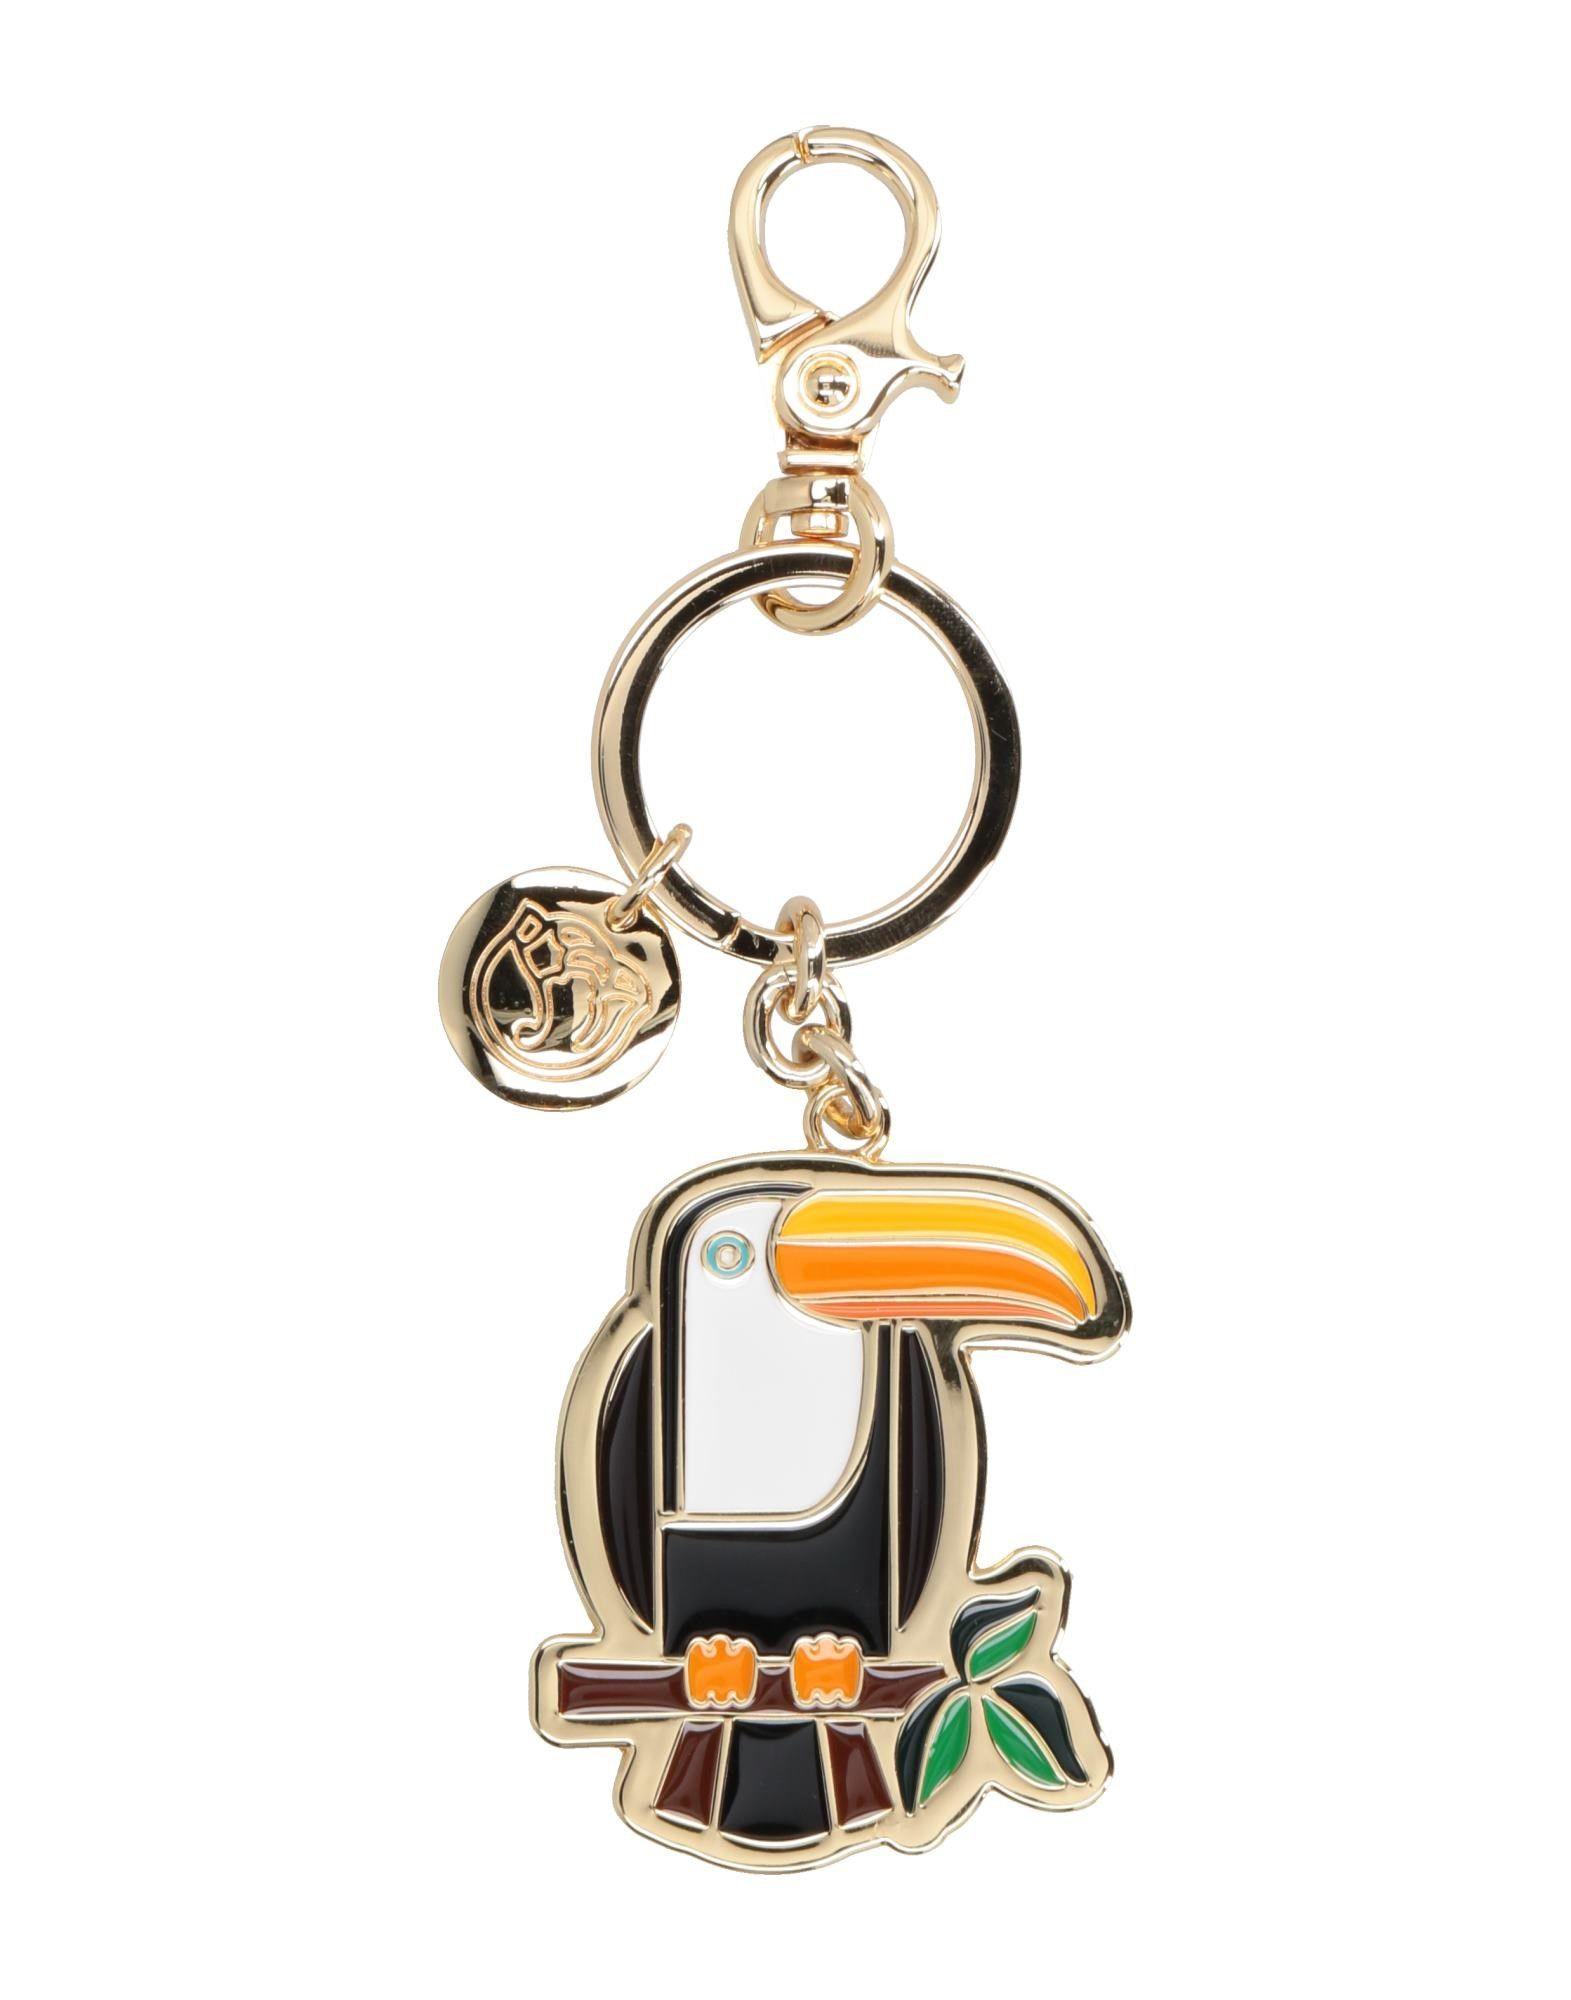 BRACCIALINI Брелок для ключей ryan roche брелок для ключей